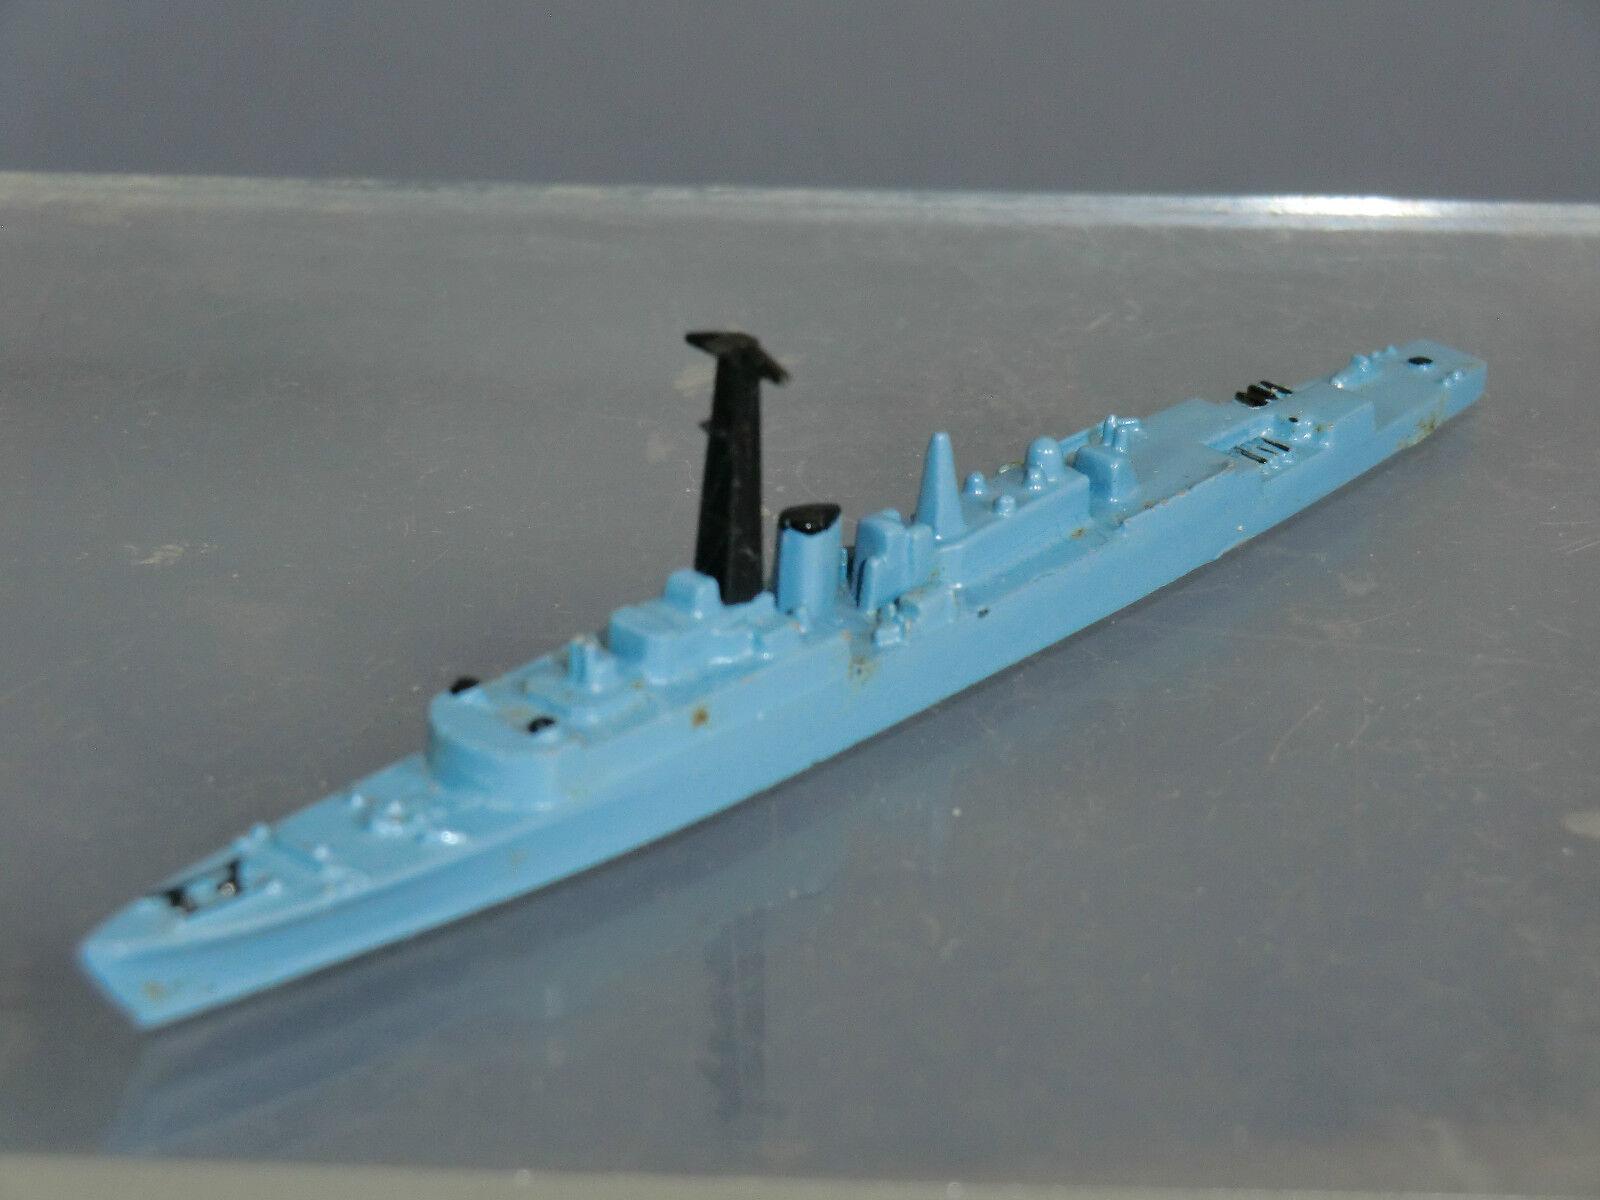 VINTAGE TRI-ANG MINIC MODEL  No.M789  HMS VIRAGO  FAST ANTI-SUBMARINE FRIGATE